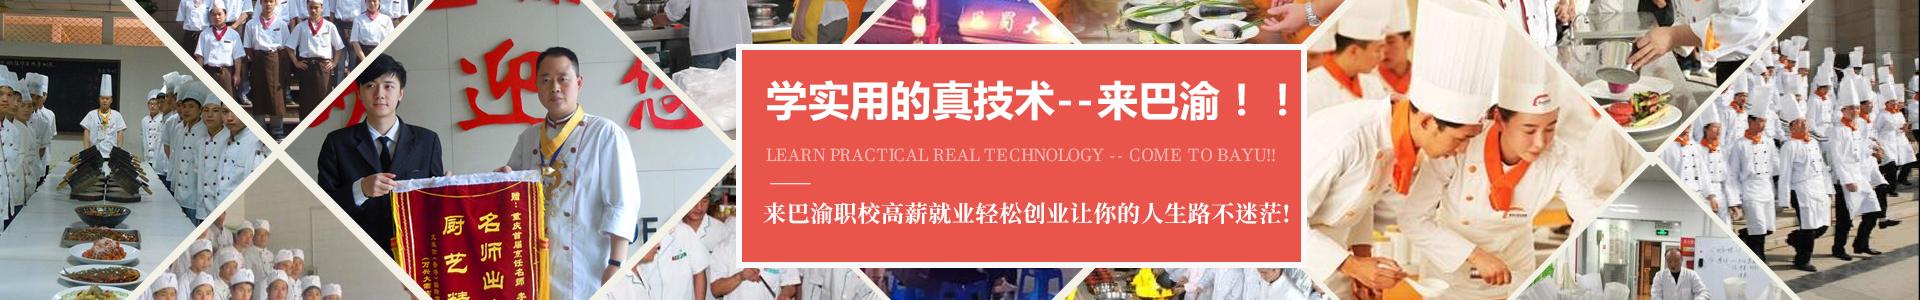 http://www.cqbayu.cn/data/images/slide/20191017105008_298.jpg